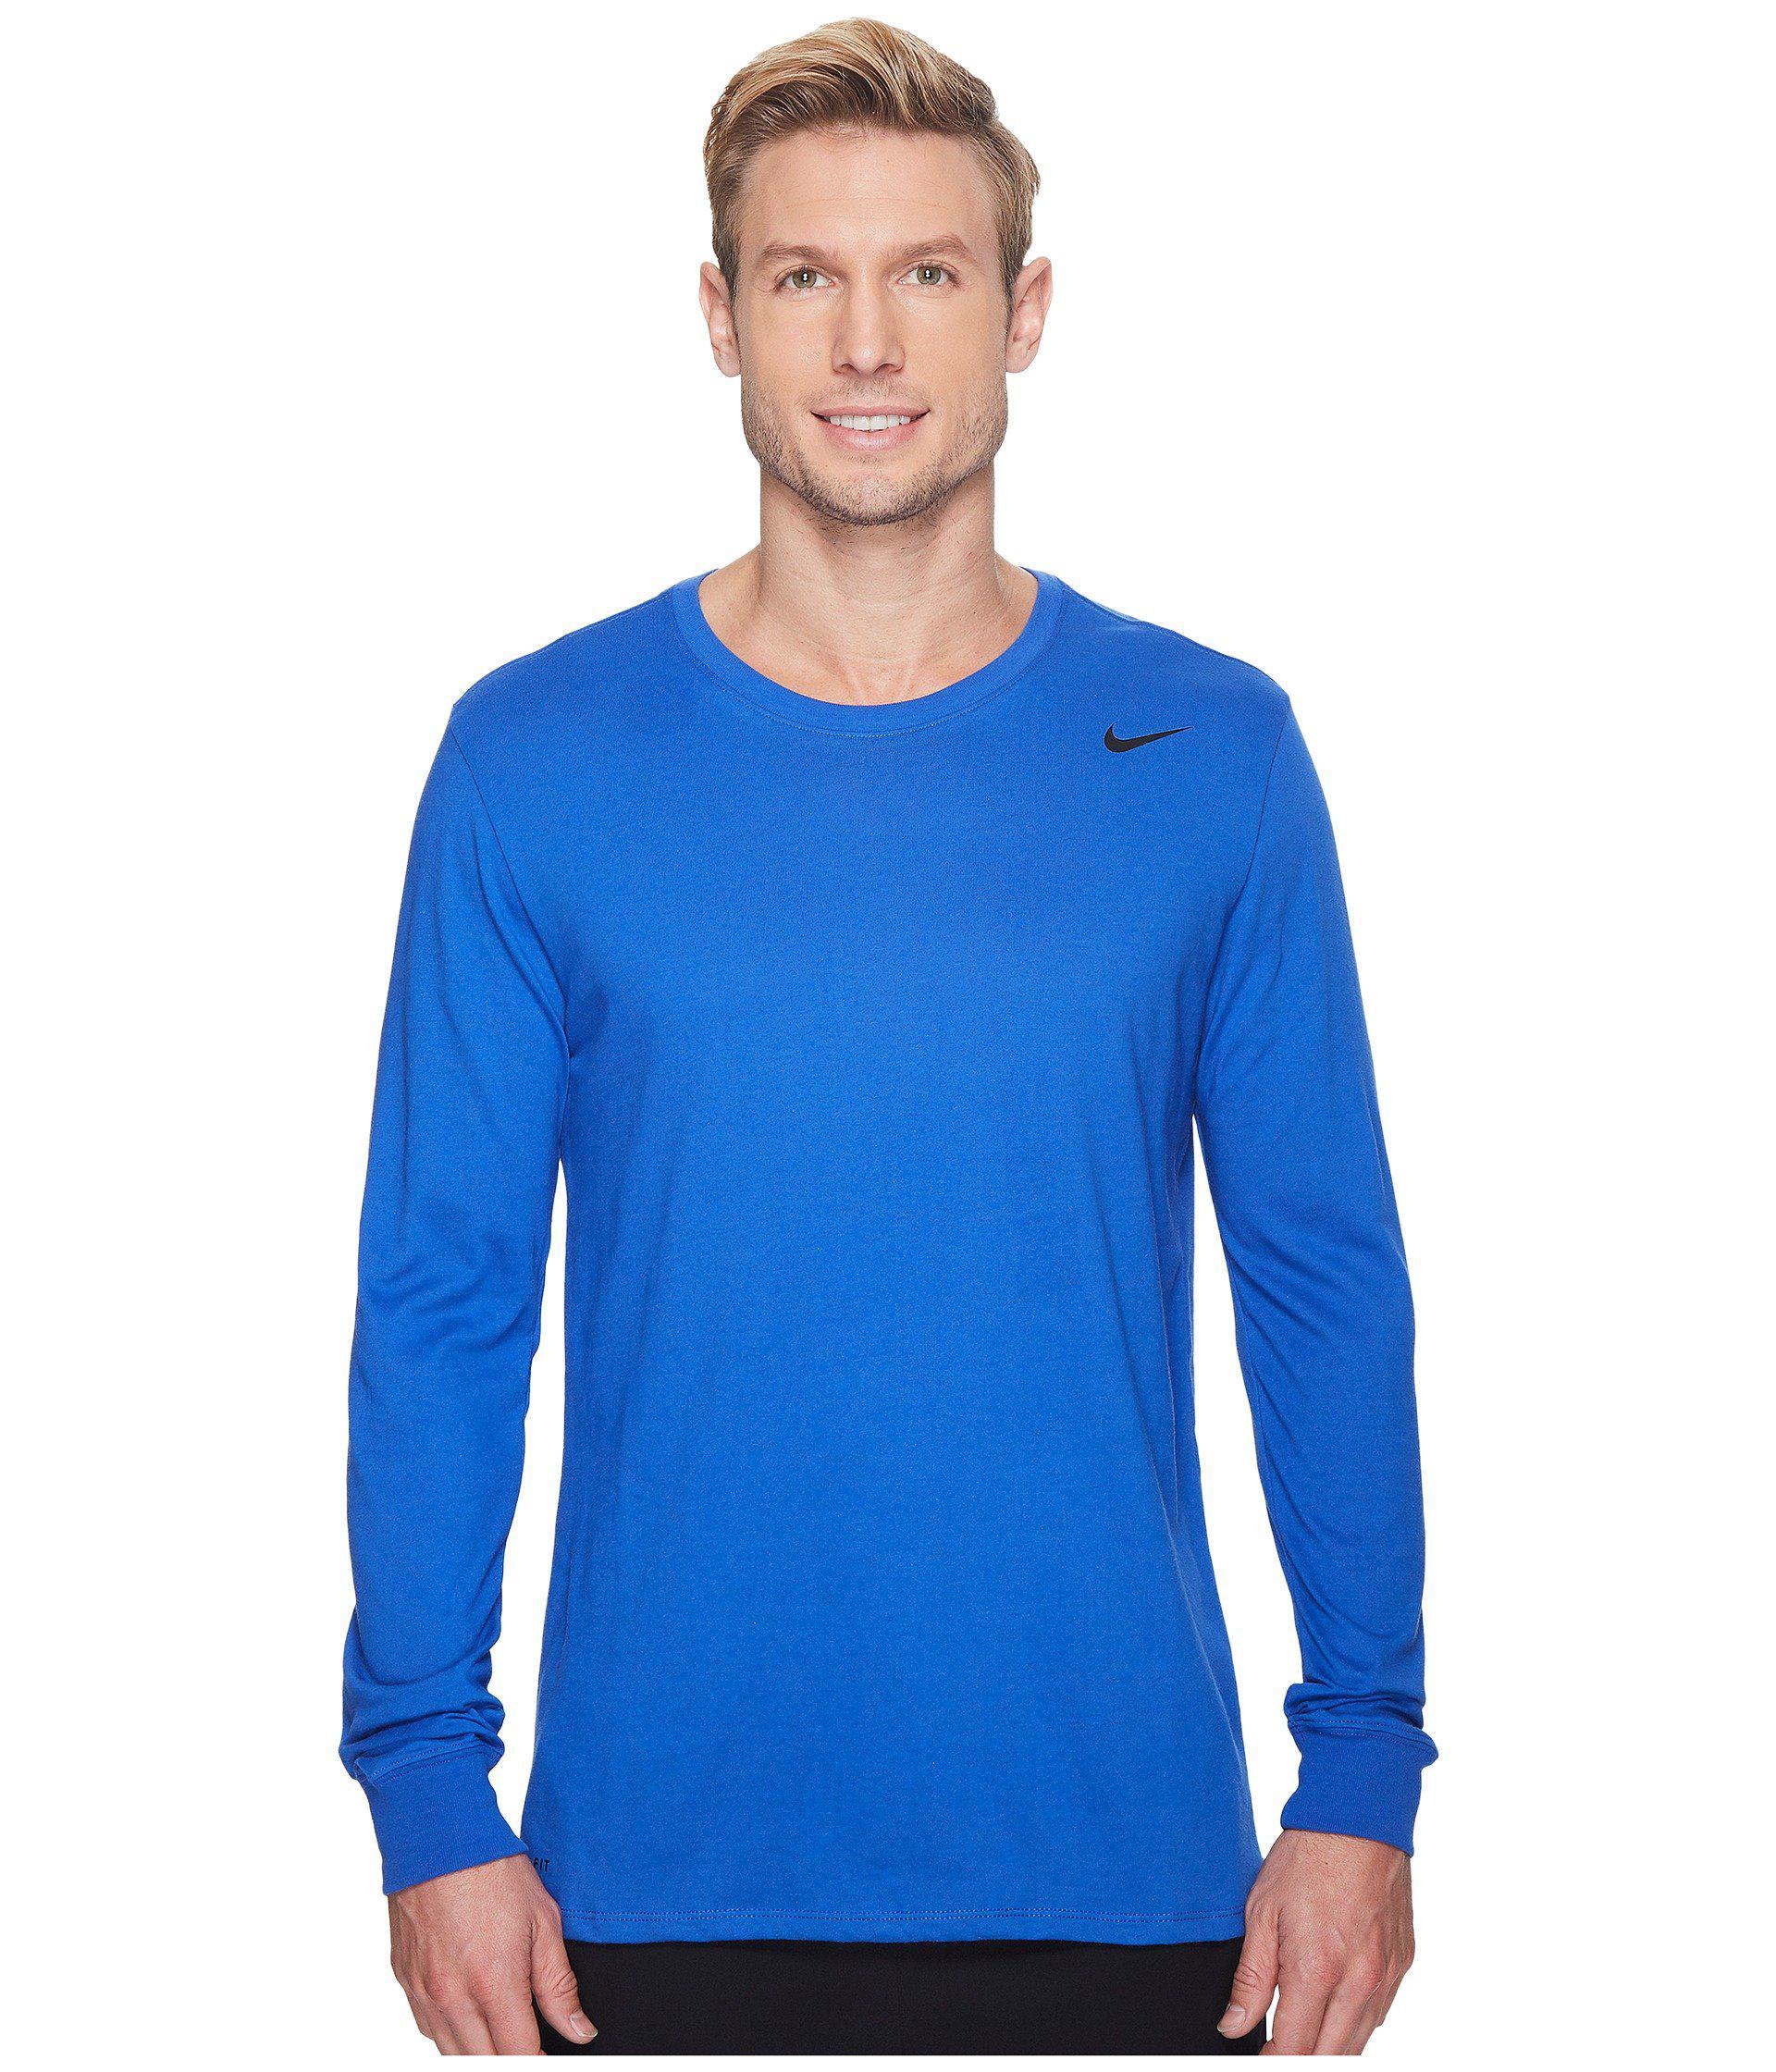 58e0e19926d Lyst - Nike Long-sleeve Dri-fit Legend Training Tee in Blue for Men ...